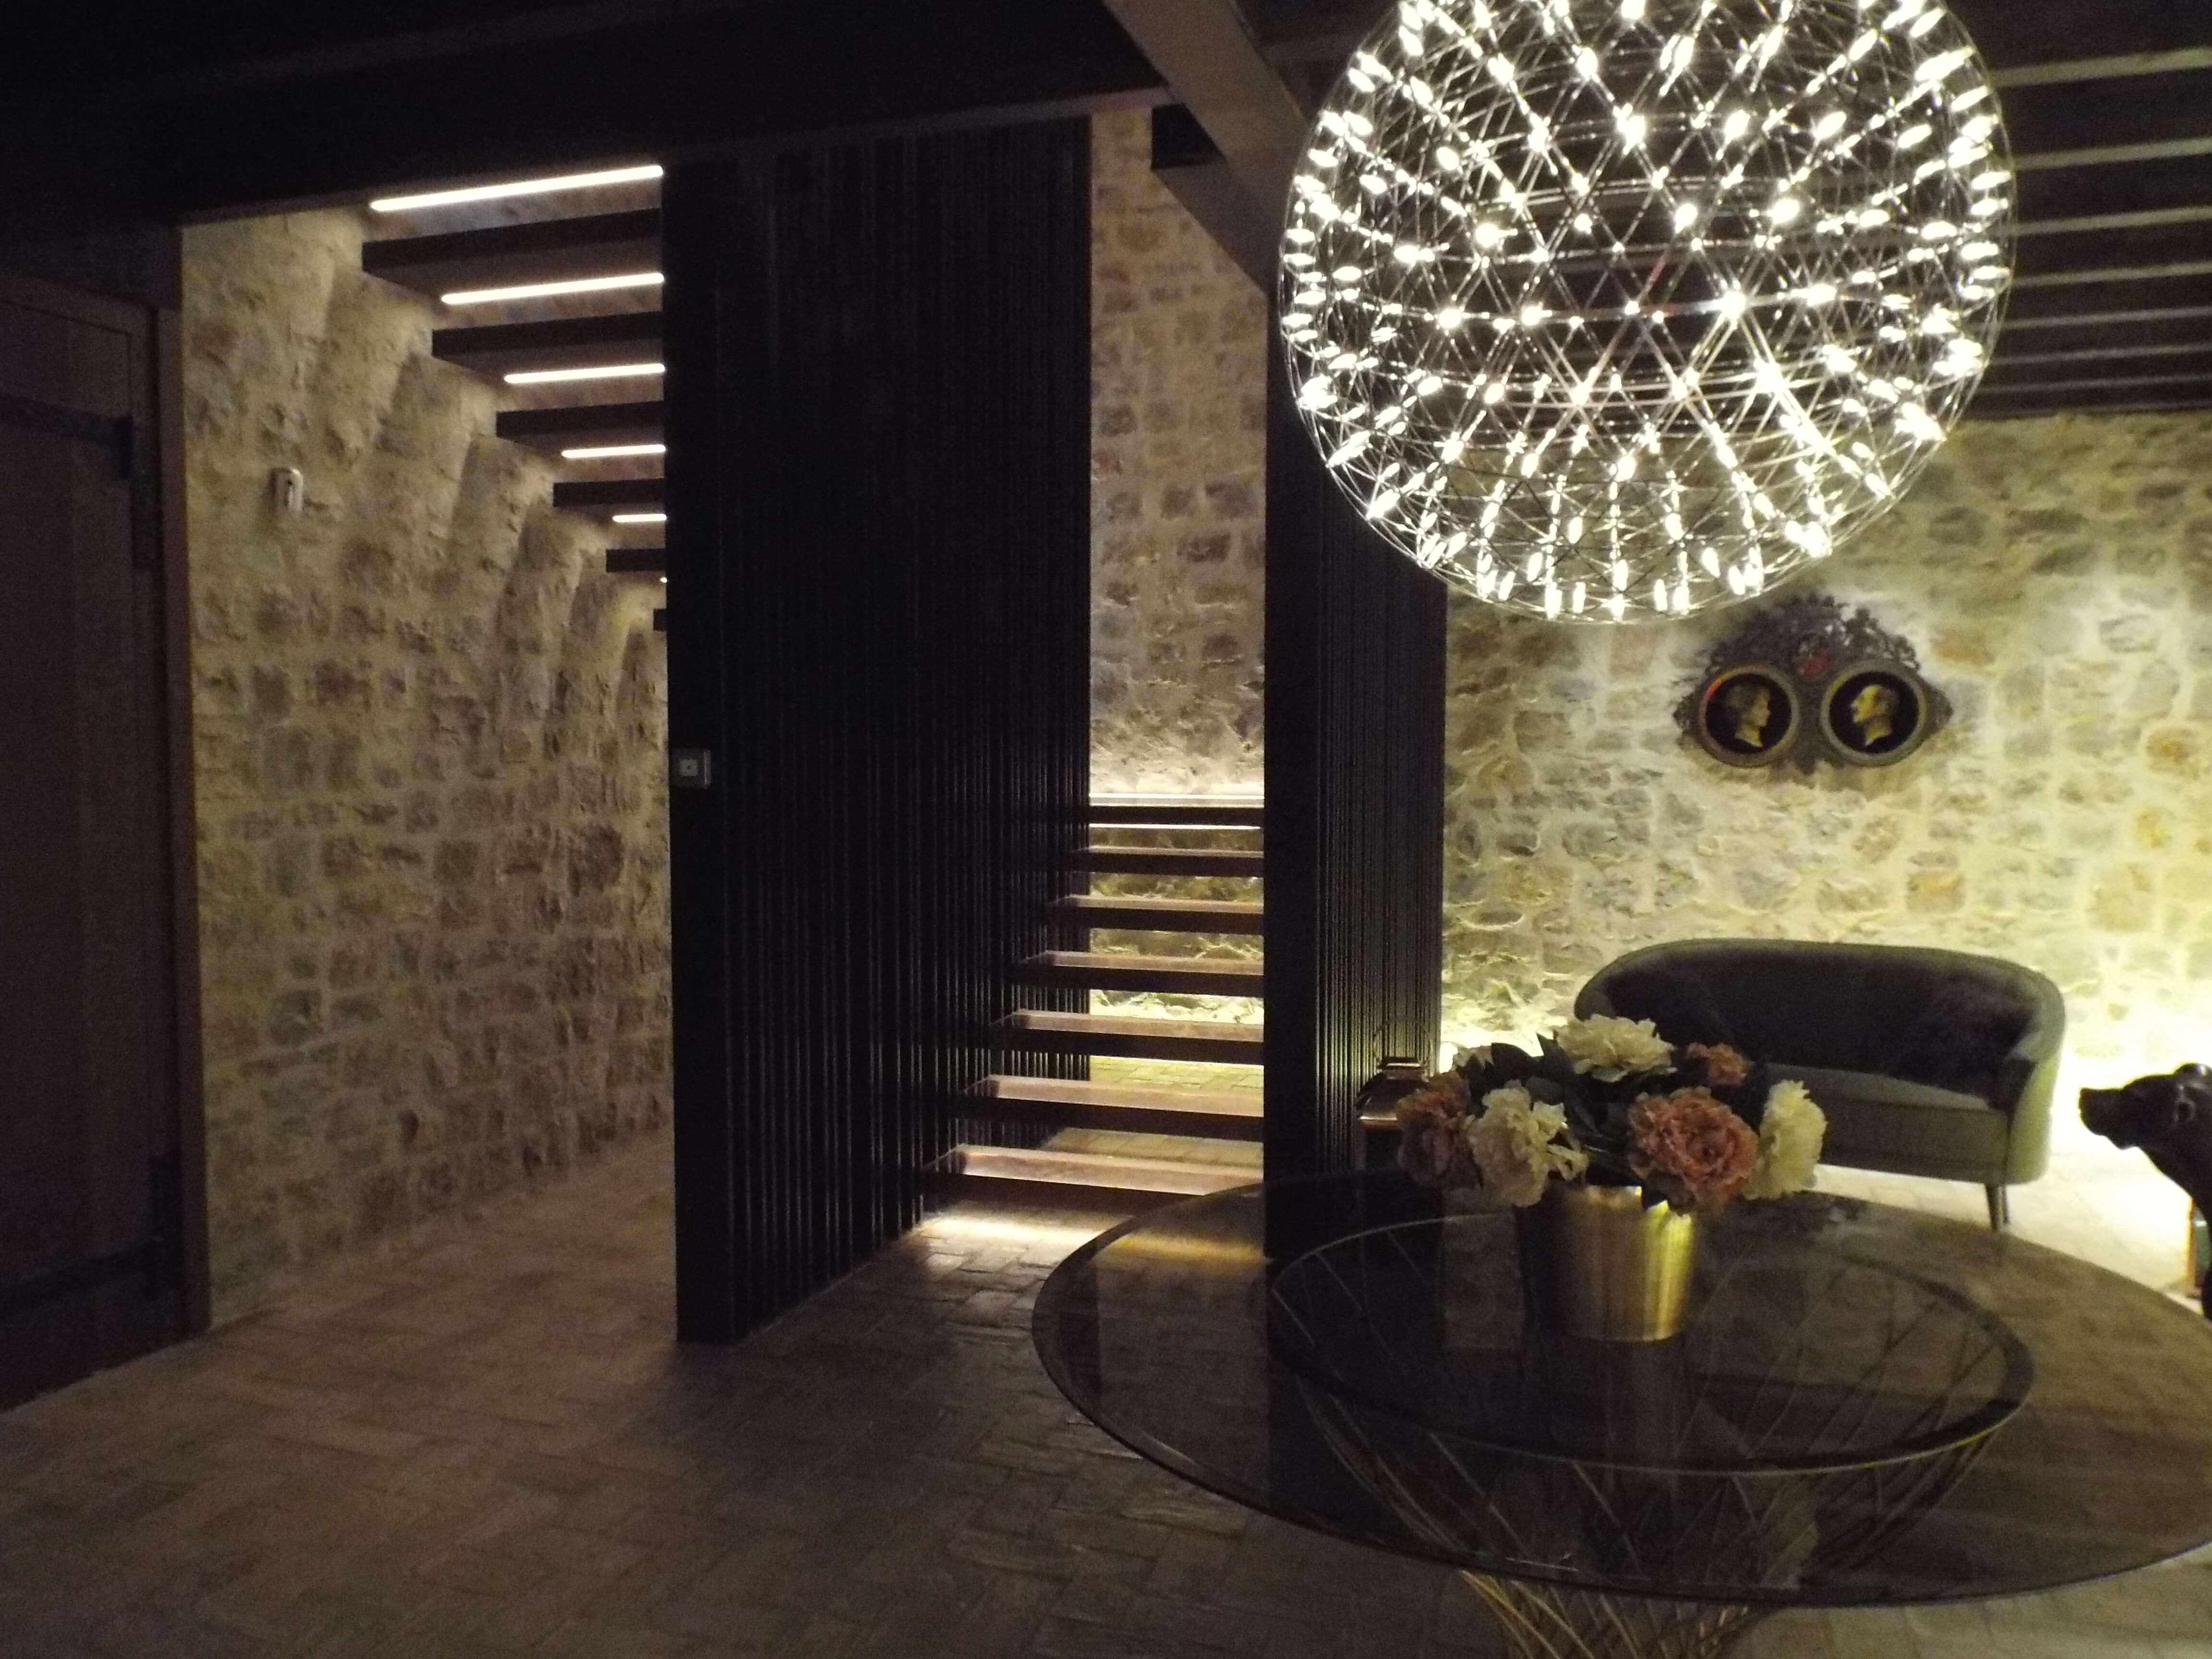 Instalación Domótica e Iluminación Rubielos de Mora (Teruel)